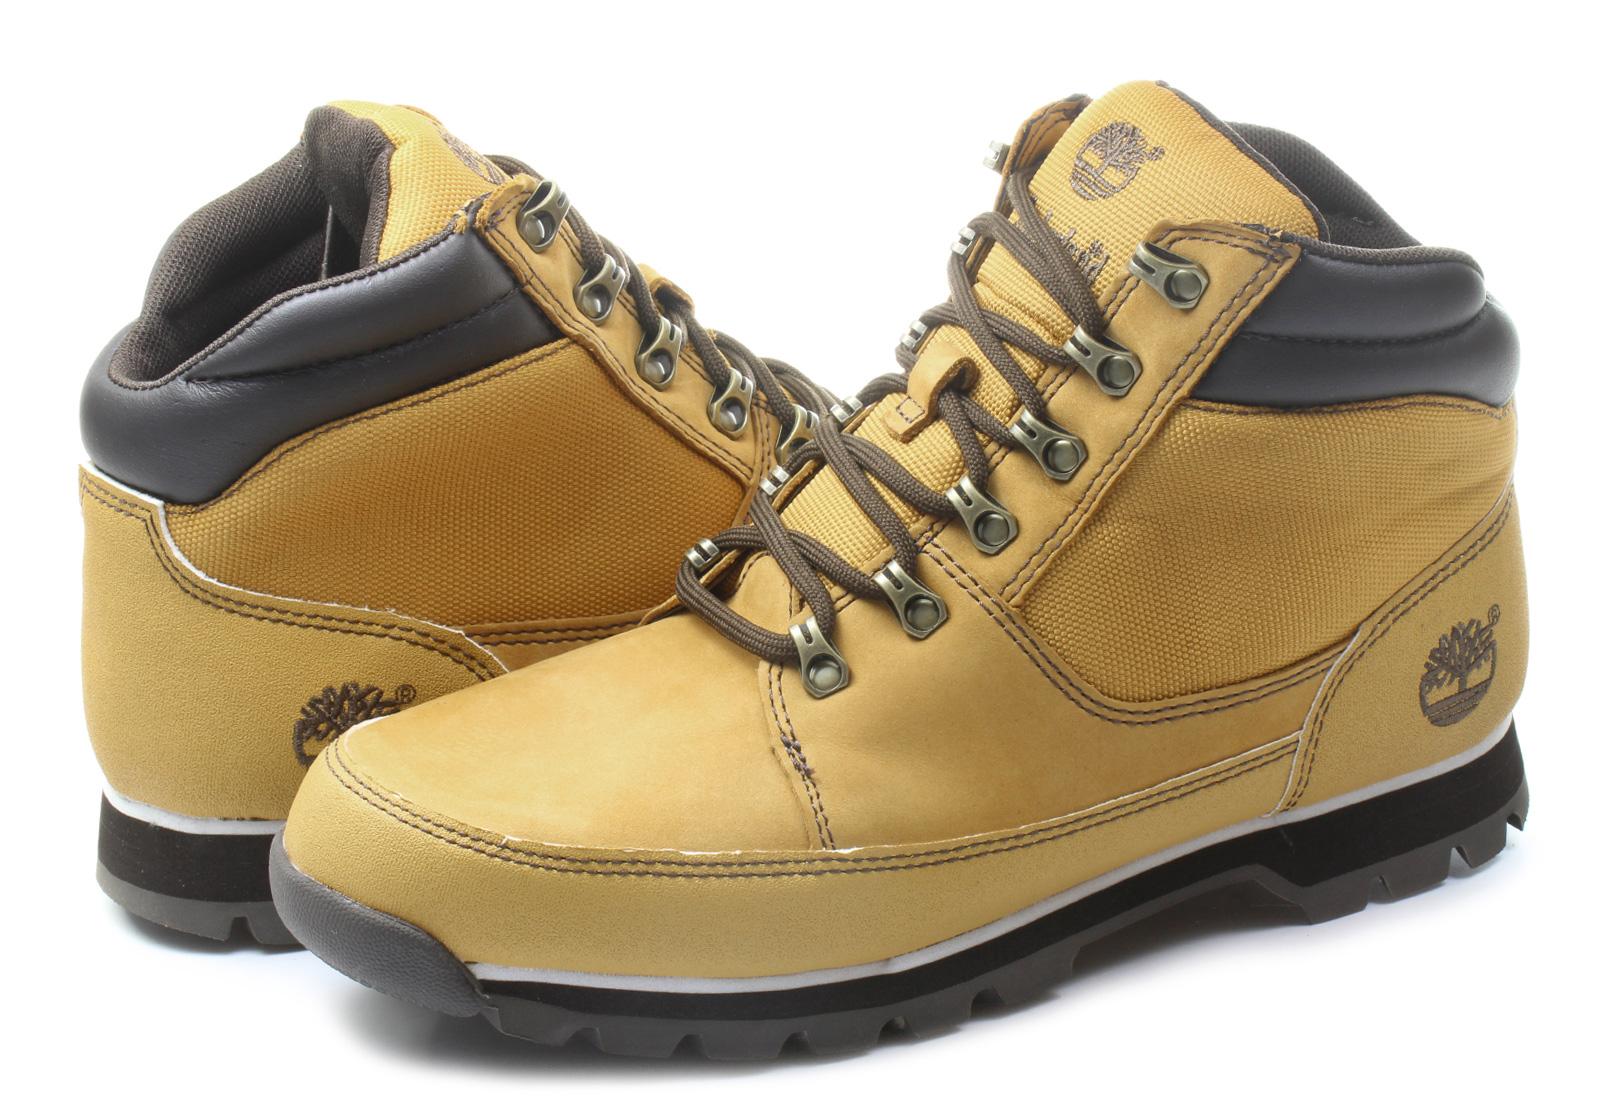 Timberland Topánky - Euro Sprint Hiker - 6703A-WHE - Tenisky ... 9cf3f6b016a